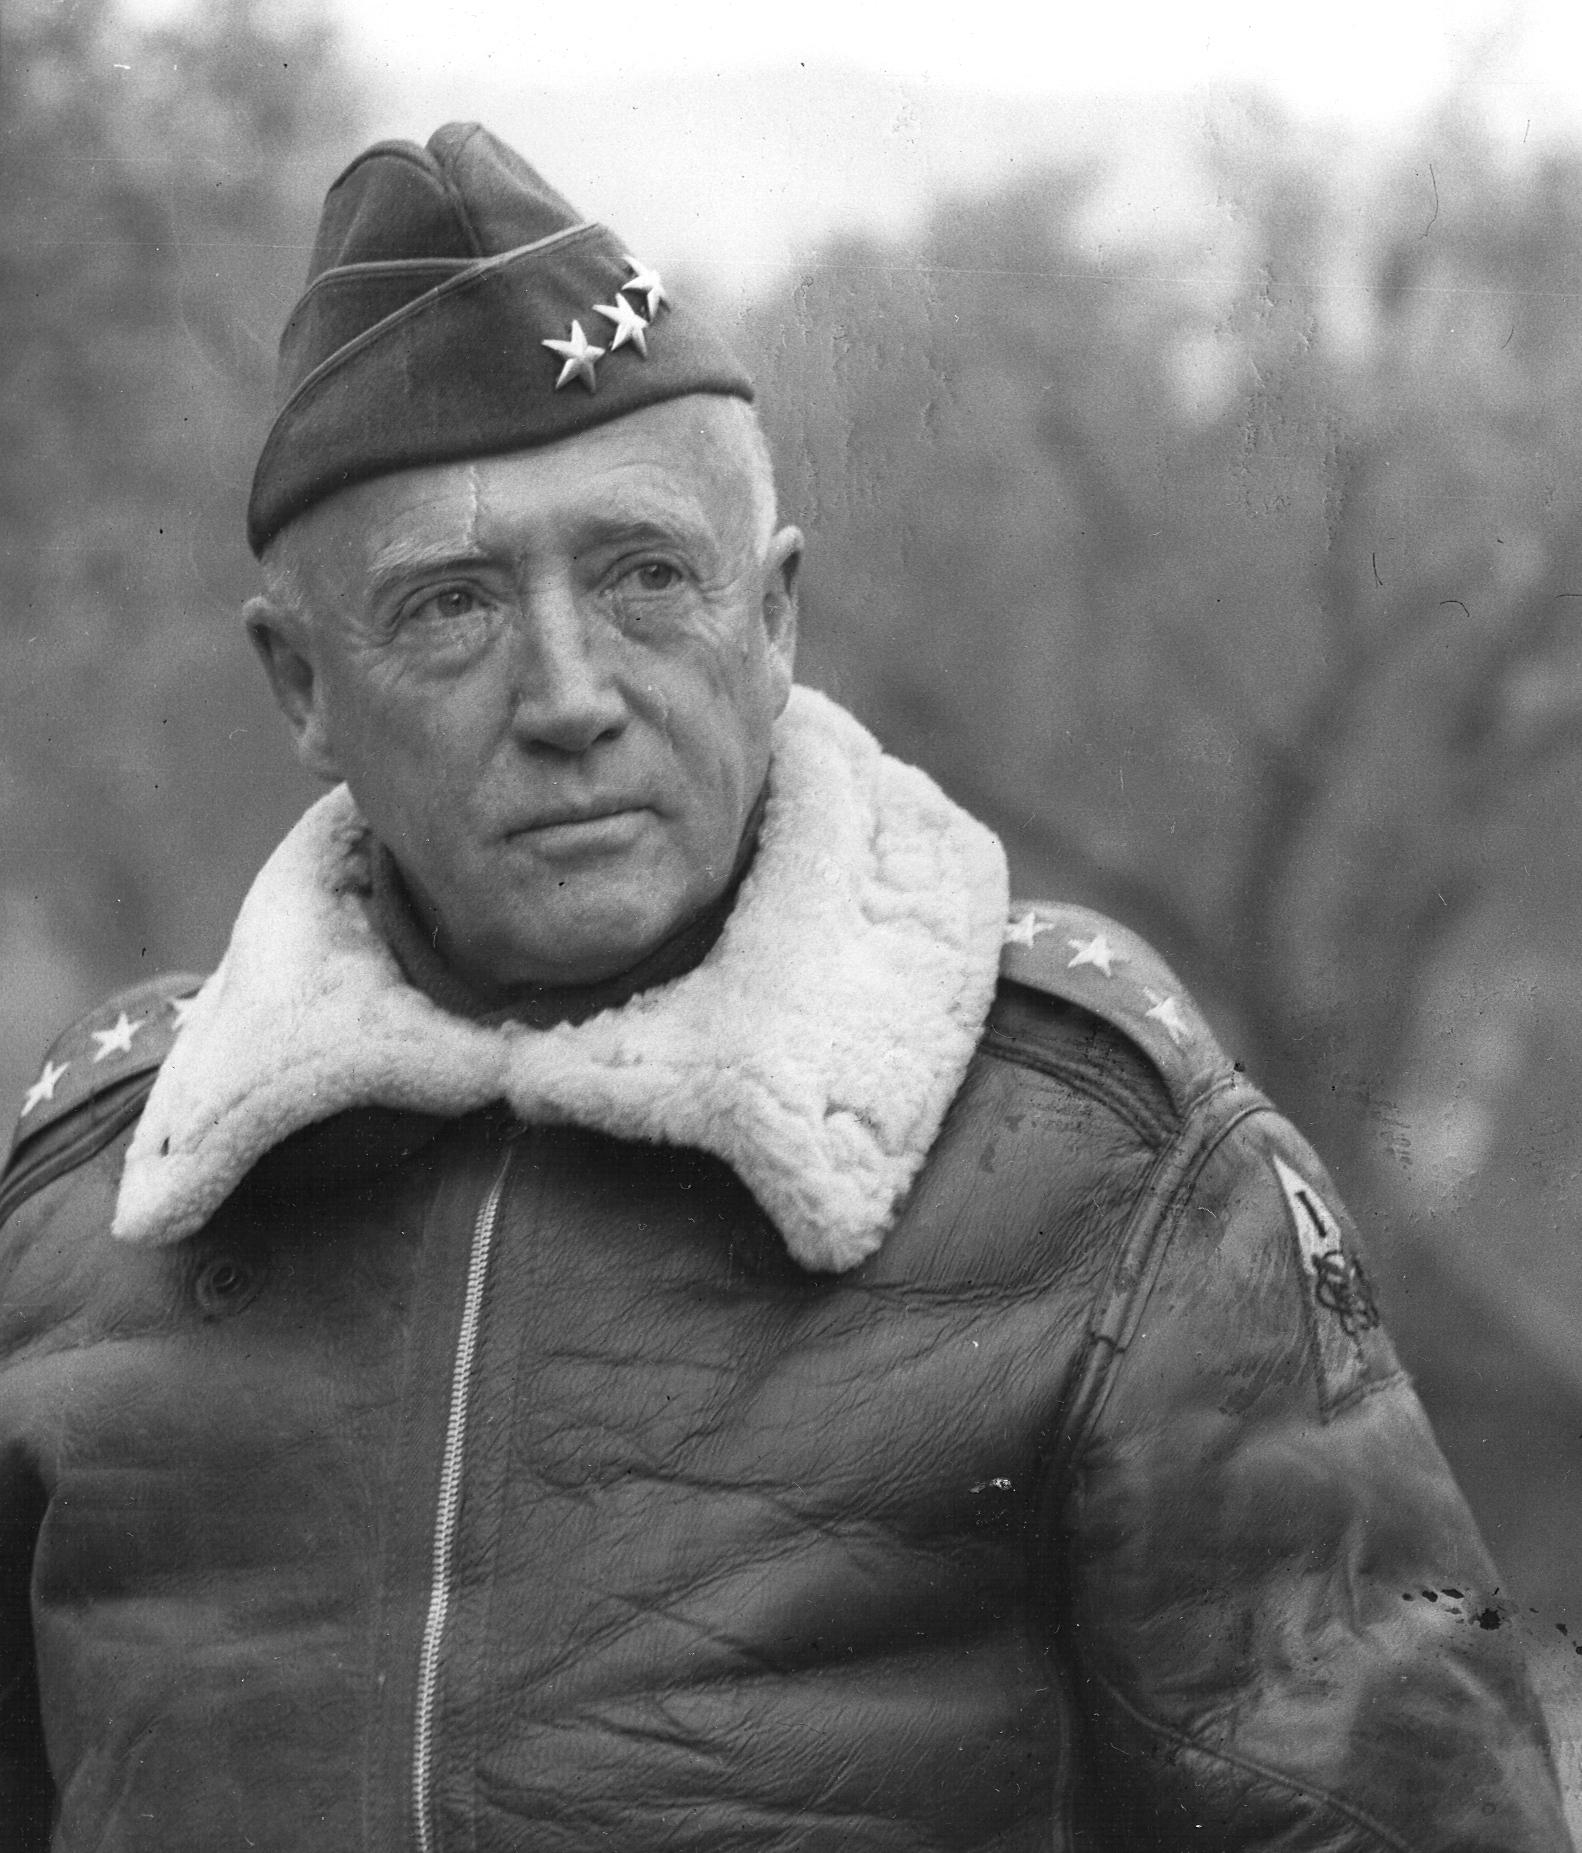 General Patton Scholarship, Pilsen, Czech Republic